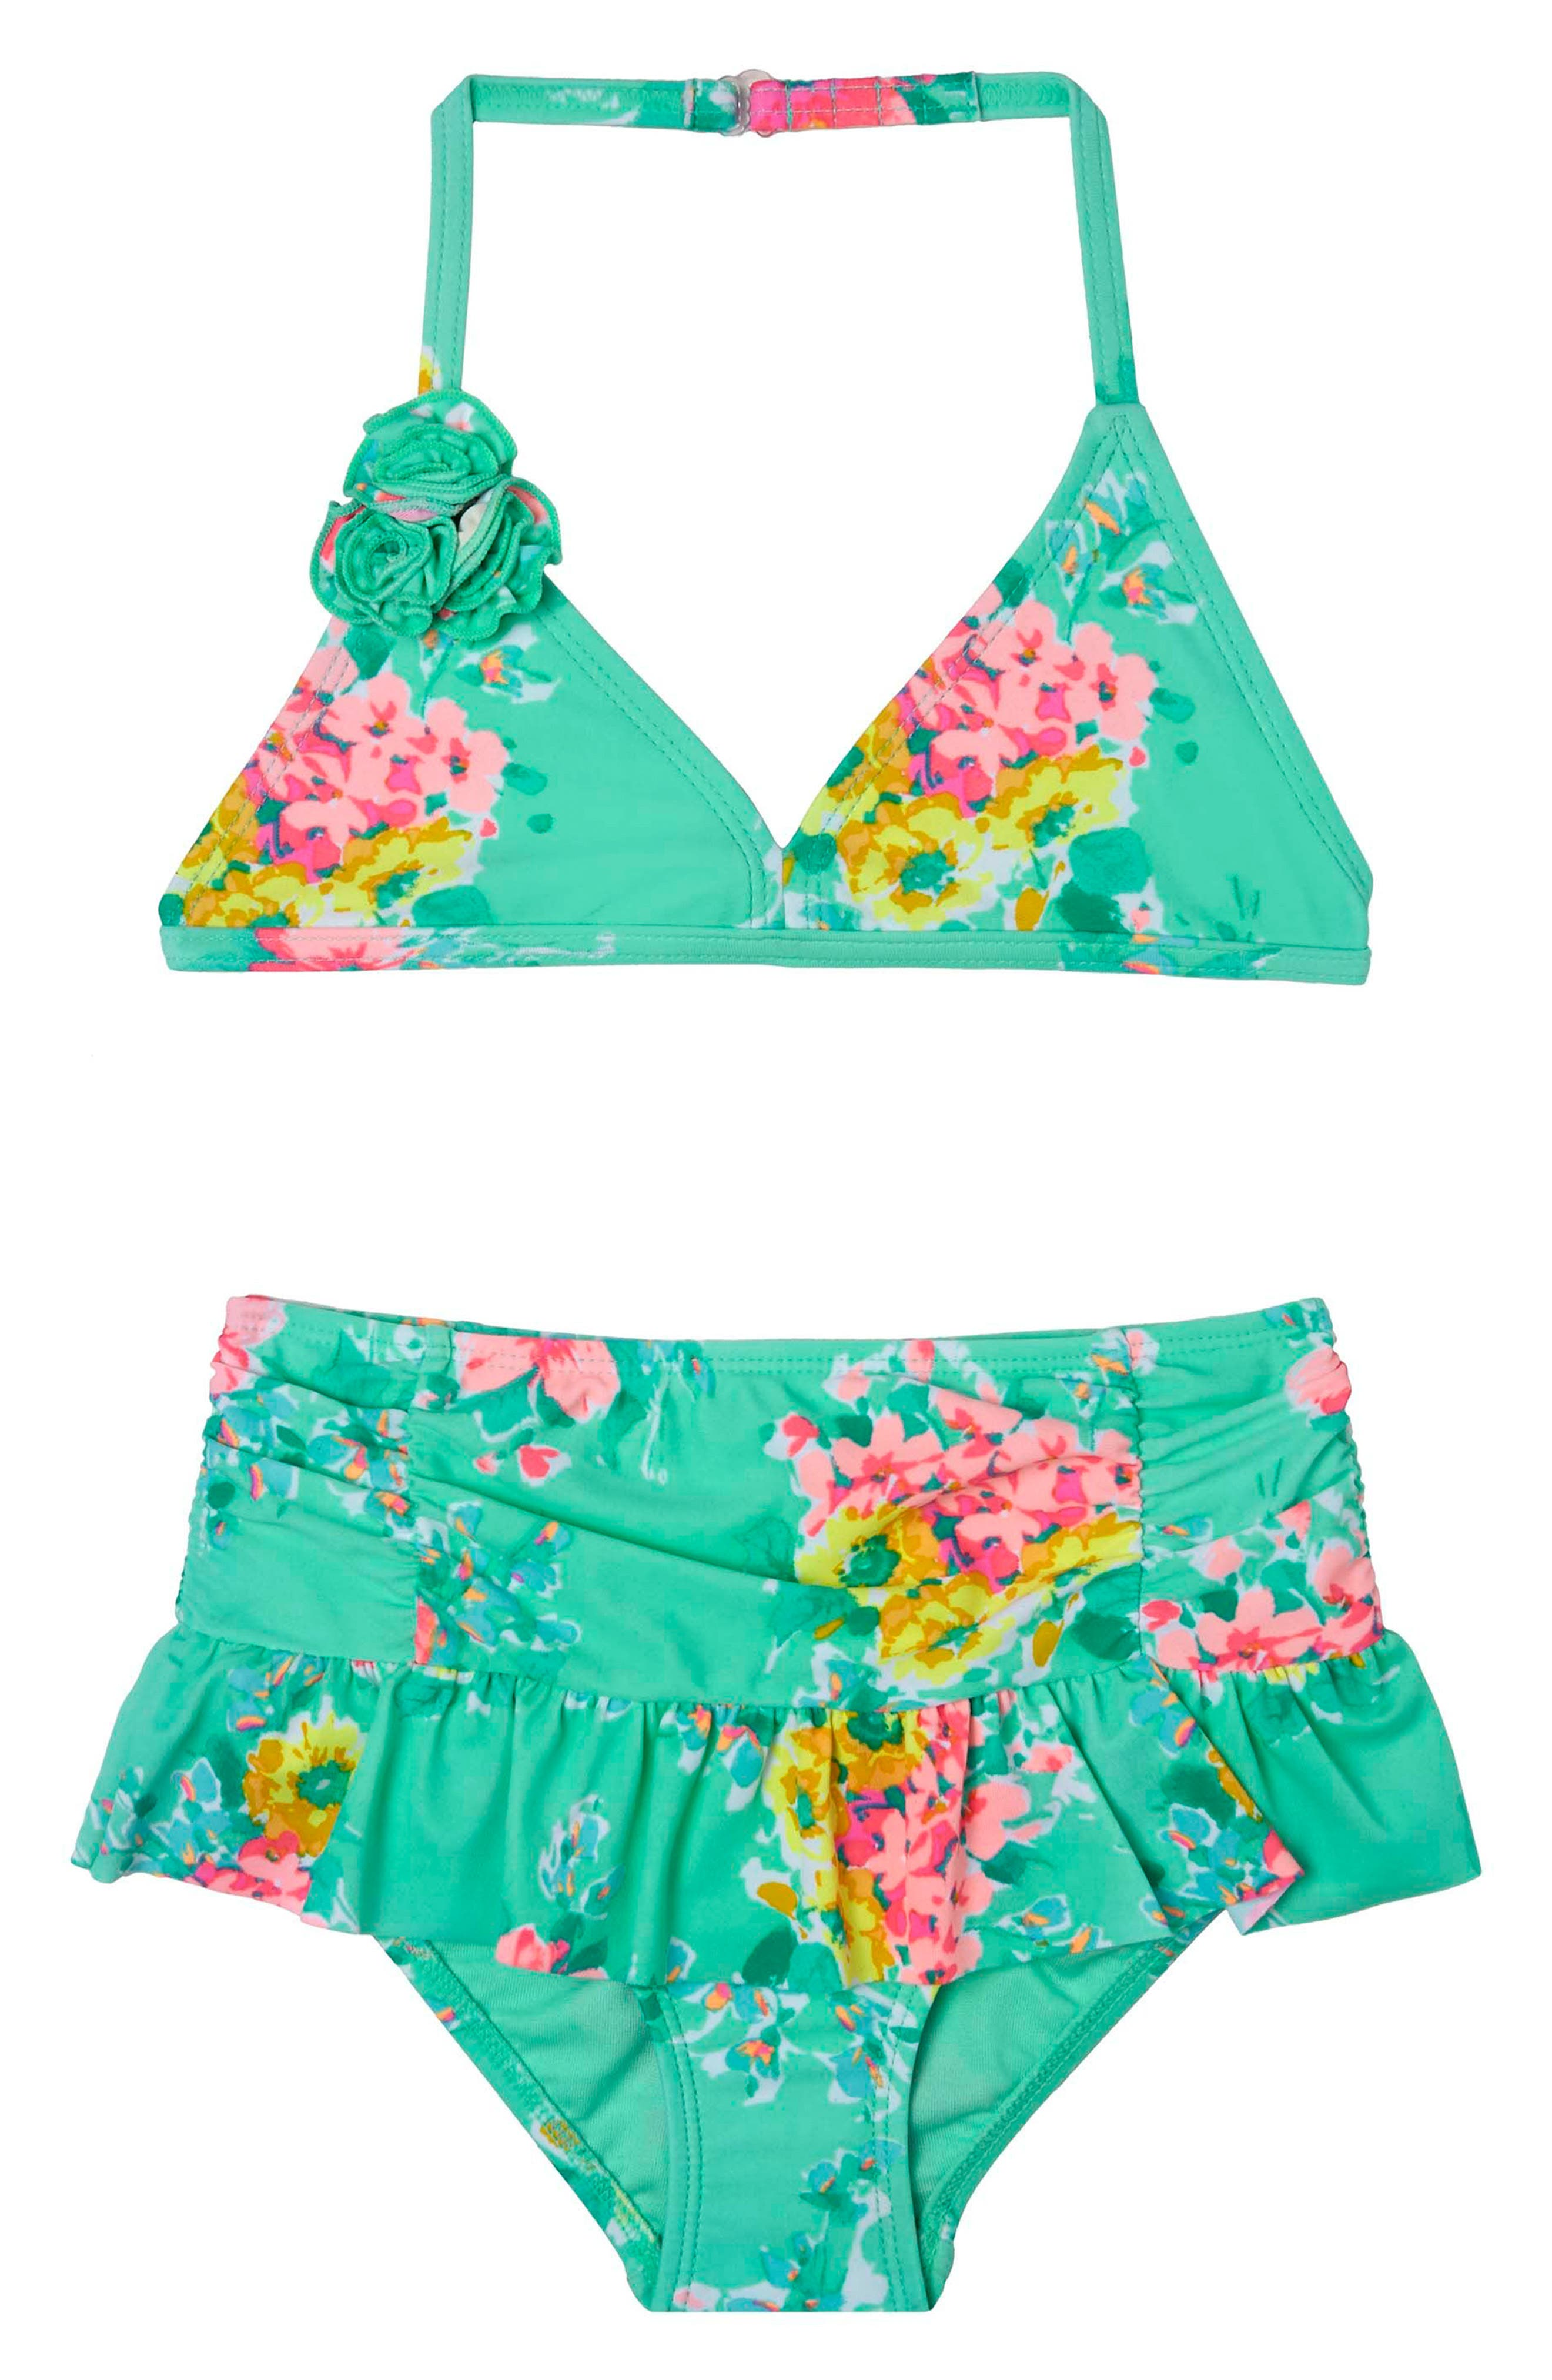 Main Image - Hula Star Garden Dream Two-Piece Swimsuit (Toddler Girls & Little Girls)